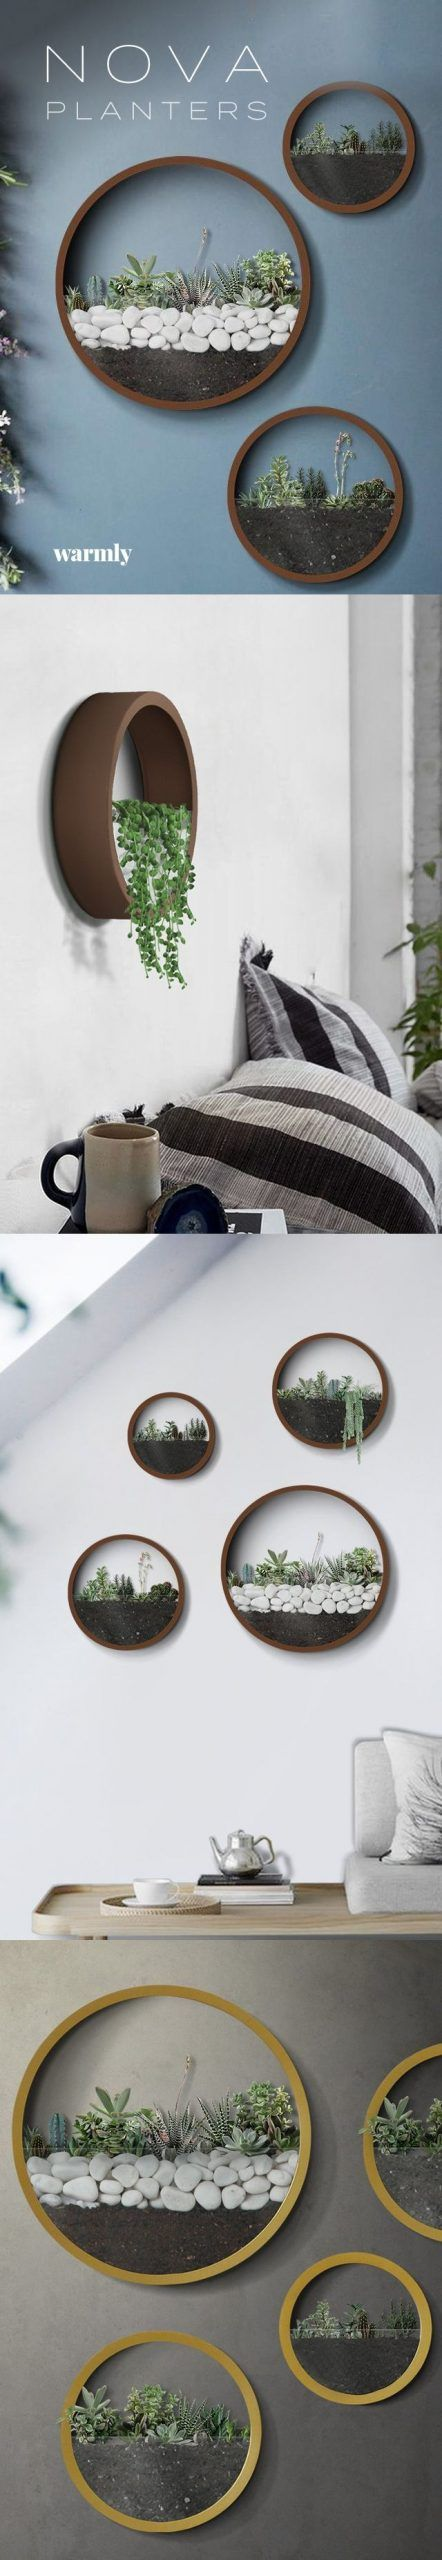 Modern Oh So Stylish Planters  — Katrina Blair | Interior Design | Small Home Style | Modern LivingKatrina Blair#blair #design #home #interior #katrina #livingkatrina #modern #planters #small #style #stylish